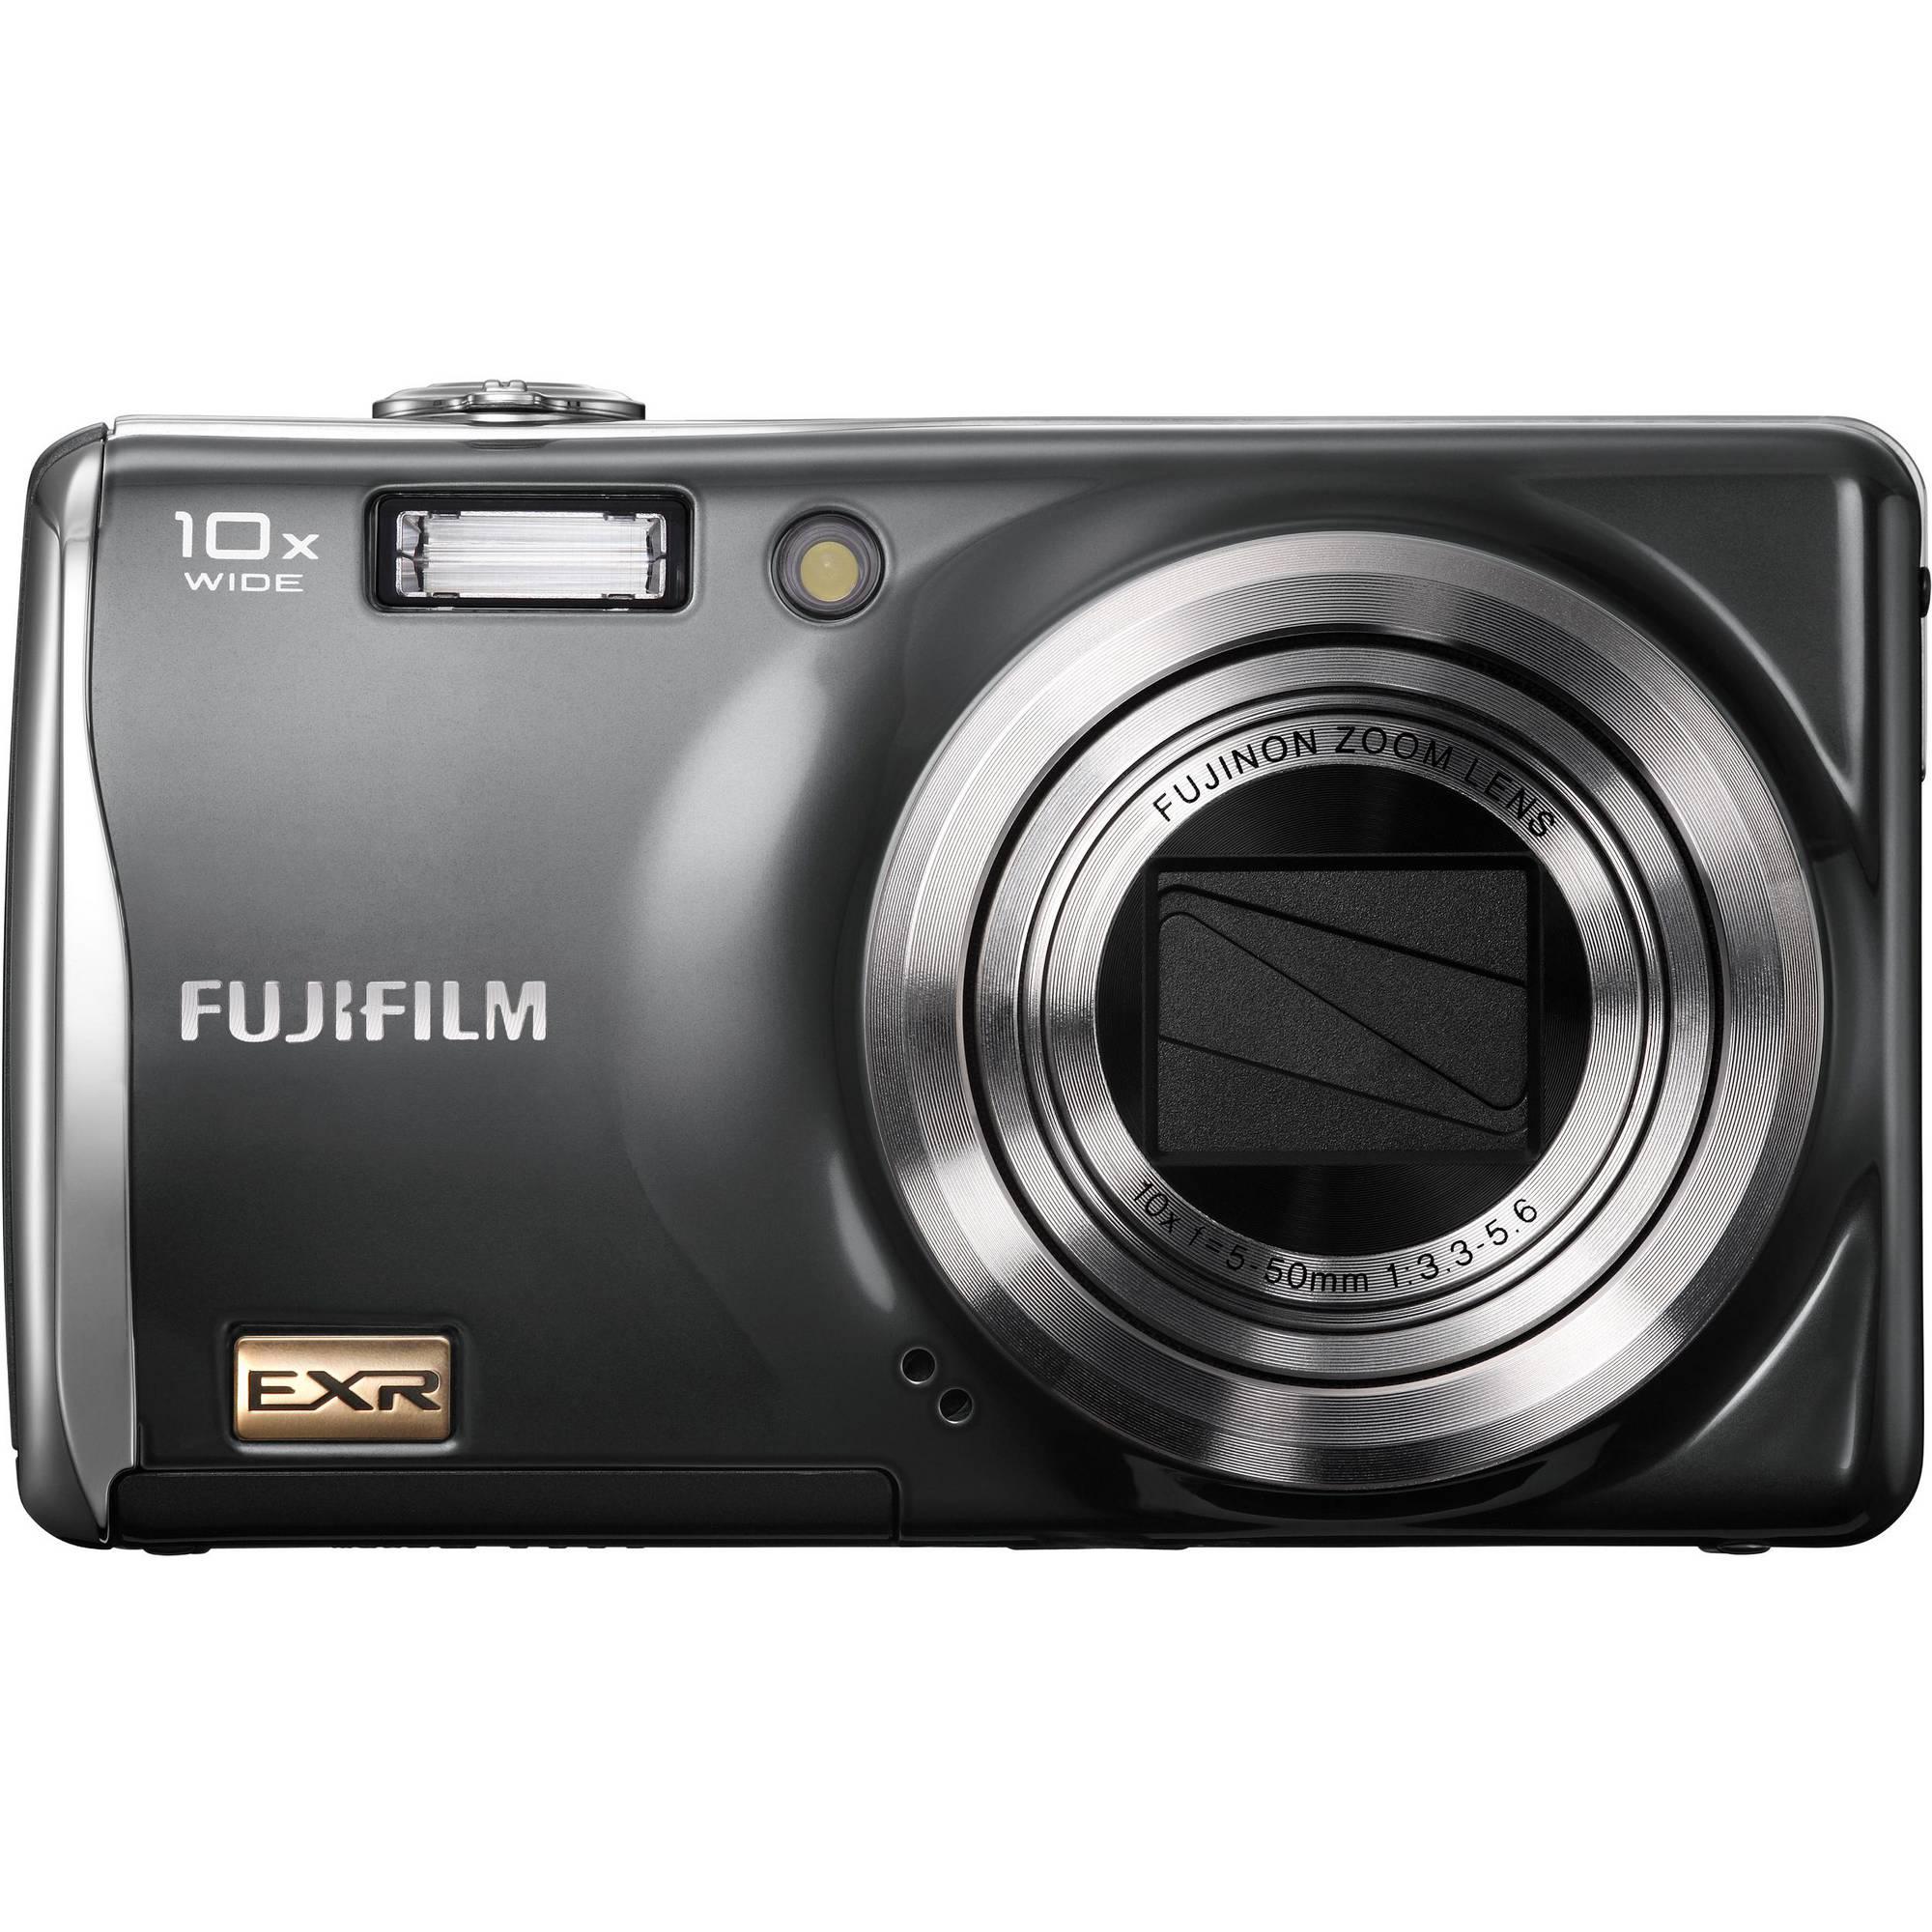 2 Pack SDHC Fujifilm FinePix F770EXR Digital Camera Memory Card 2 x 16GB Secure Digital High Capacity Memory Cards